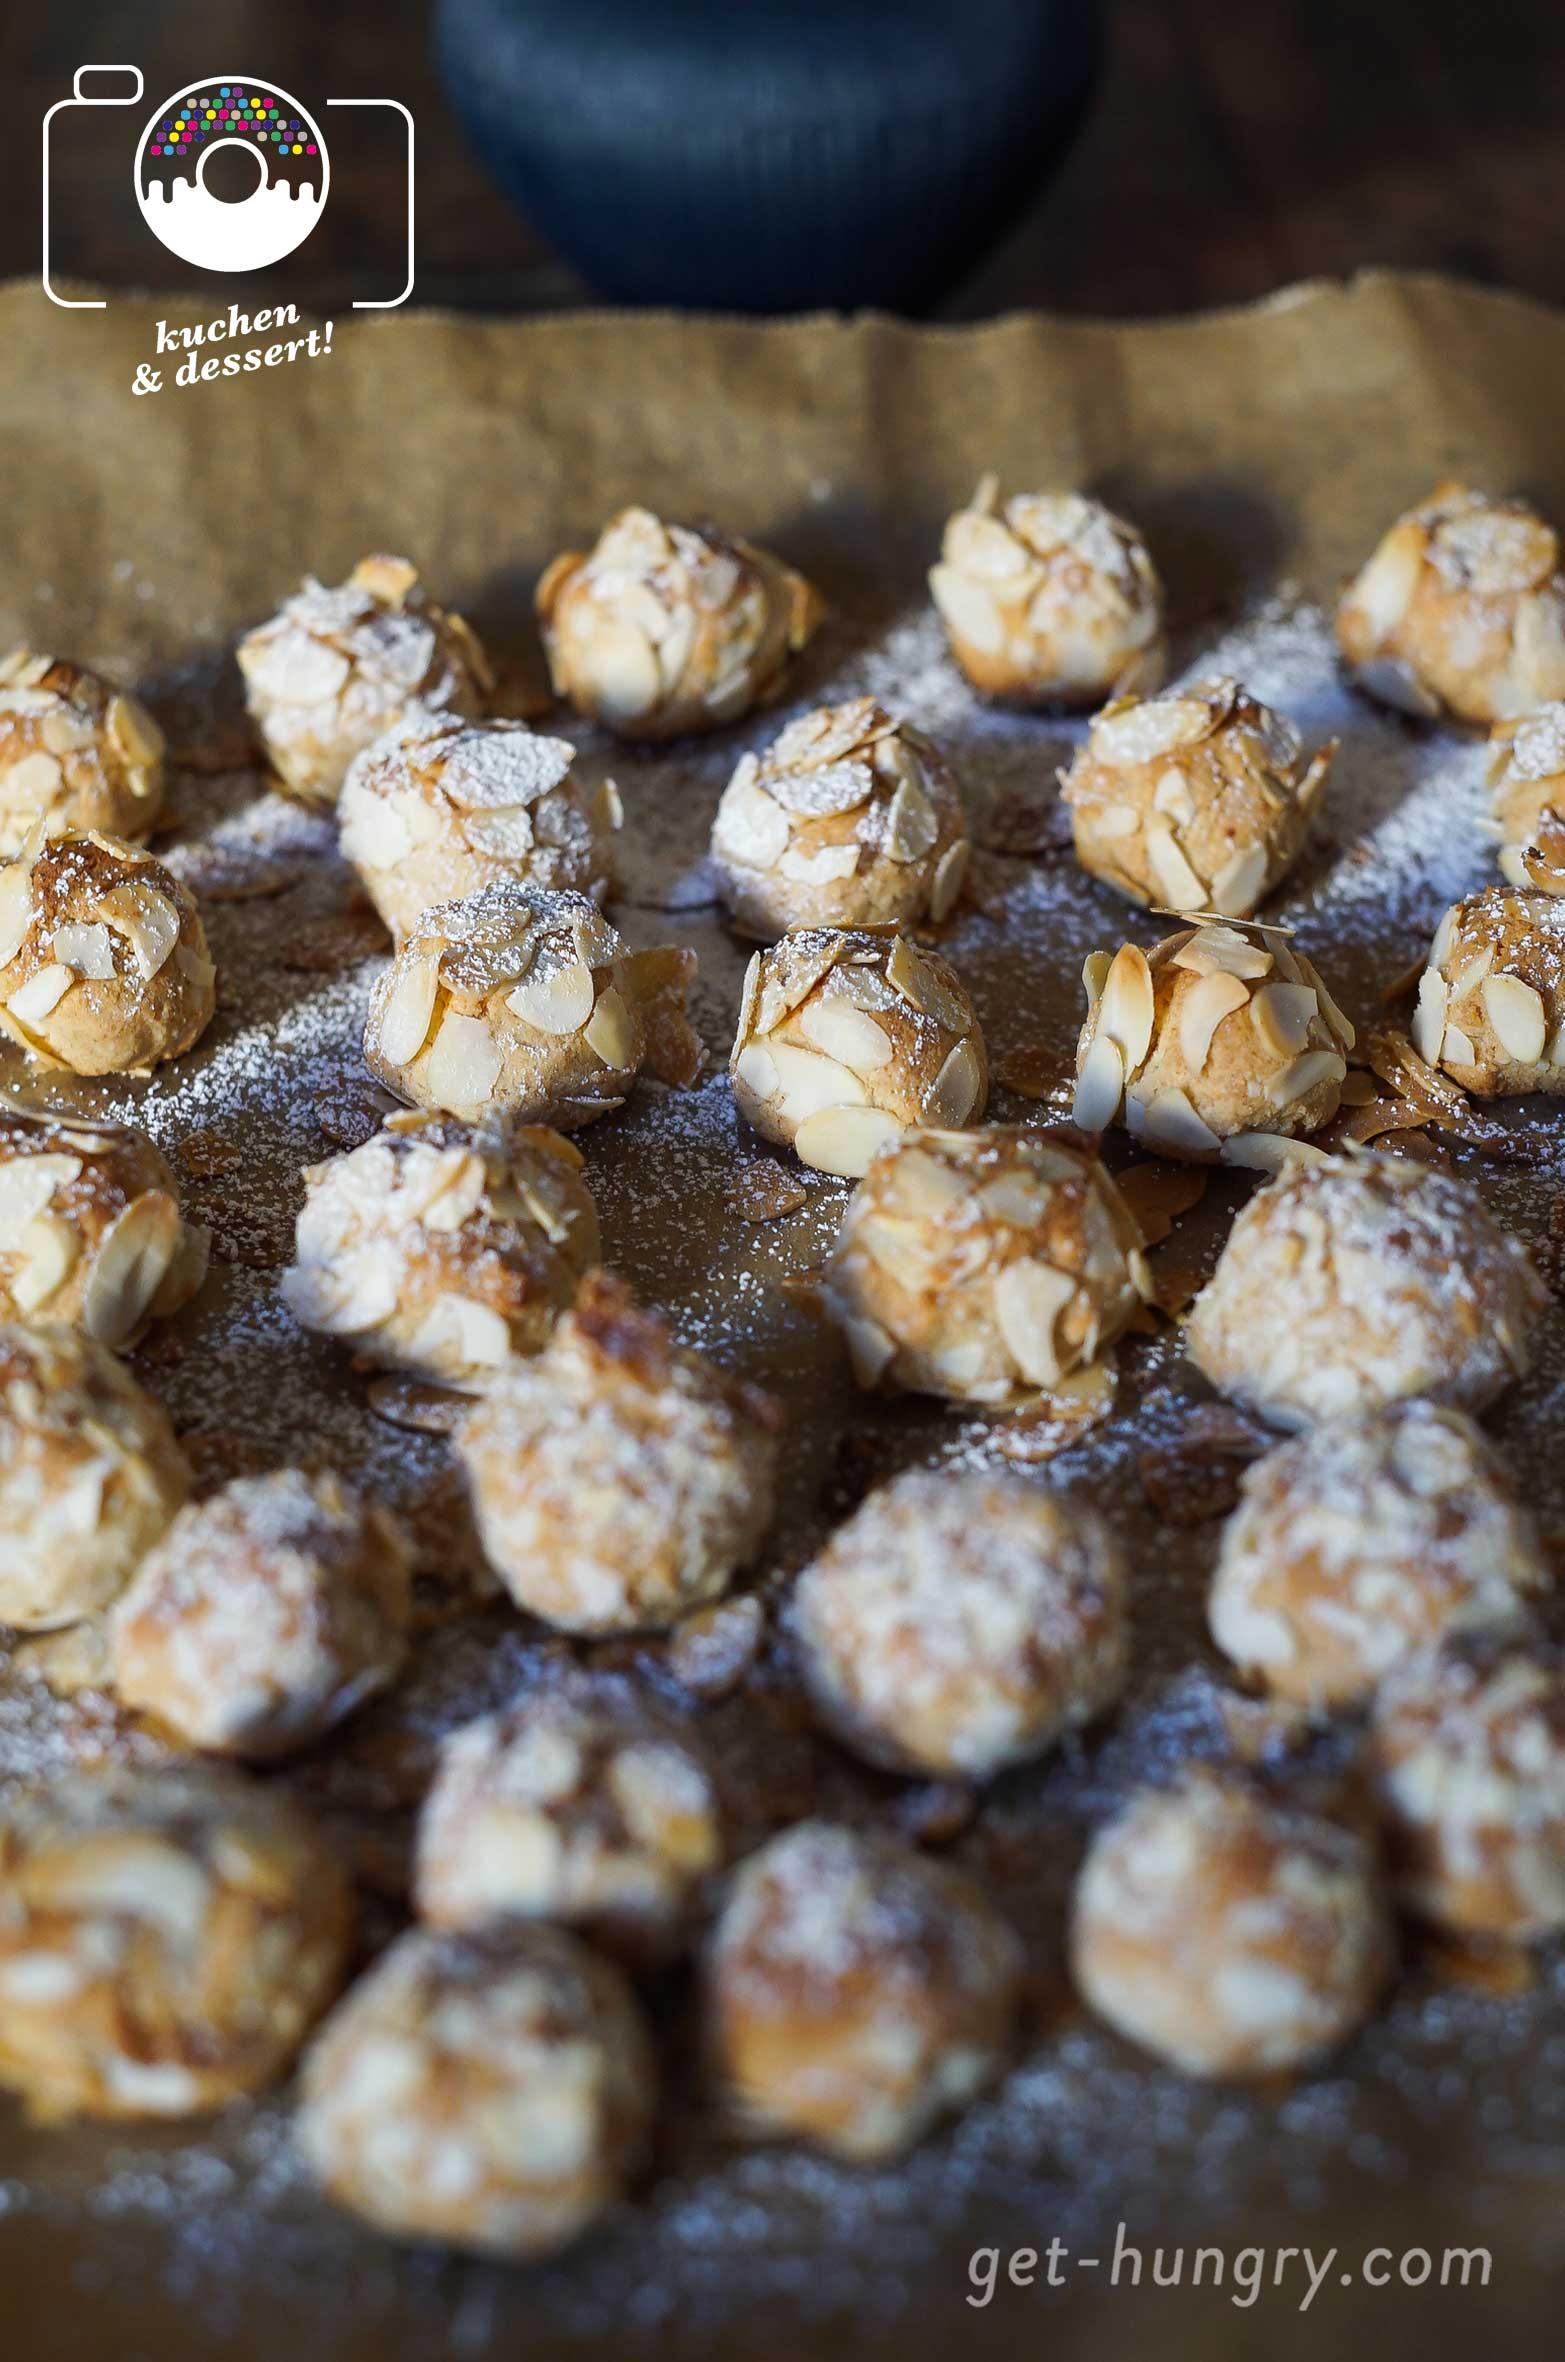 Mandelaroma satt - Italienisches Keksgeflüster mit Mandorlini-Kugeln